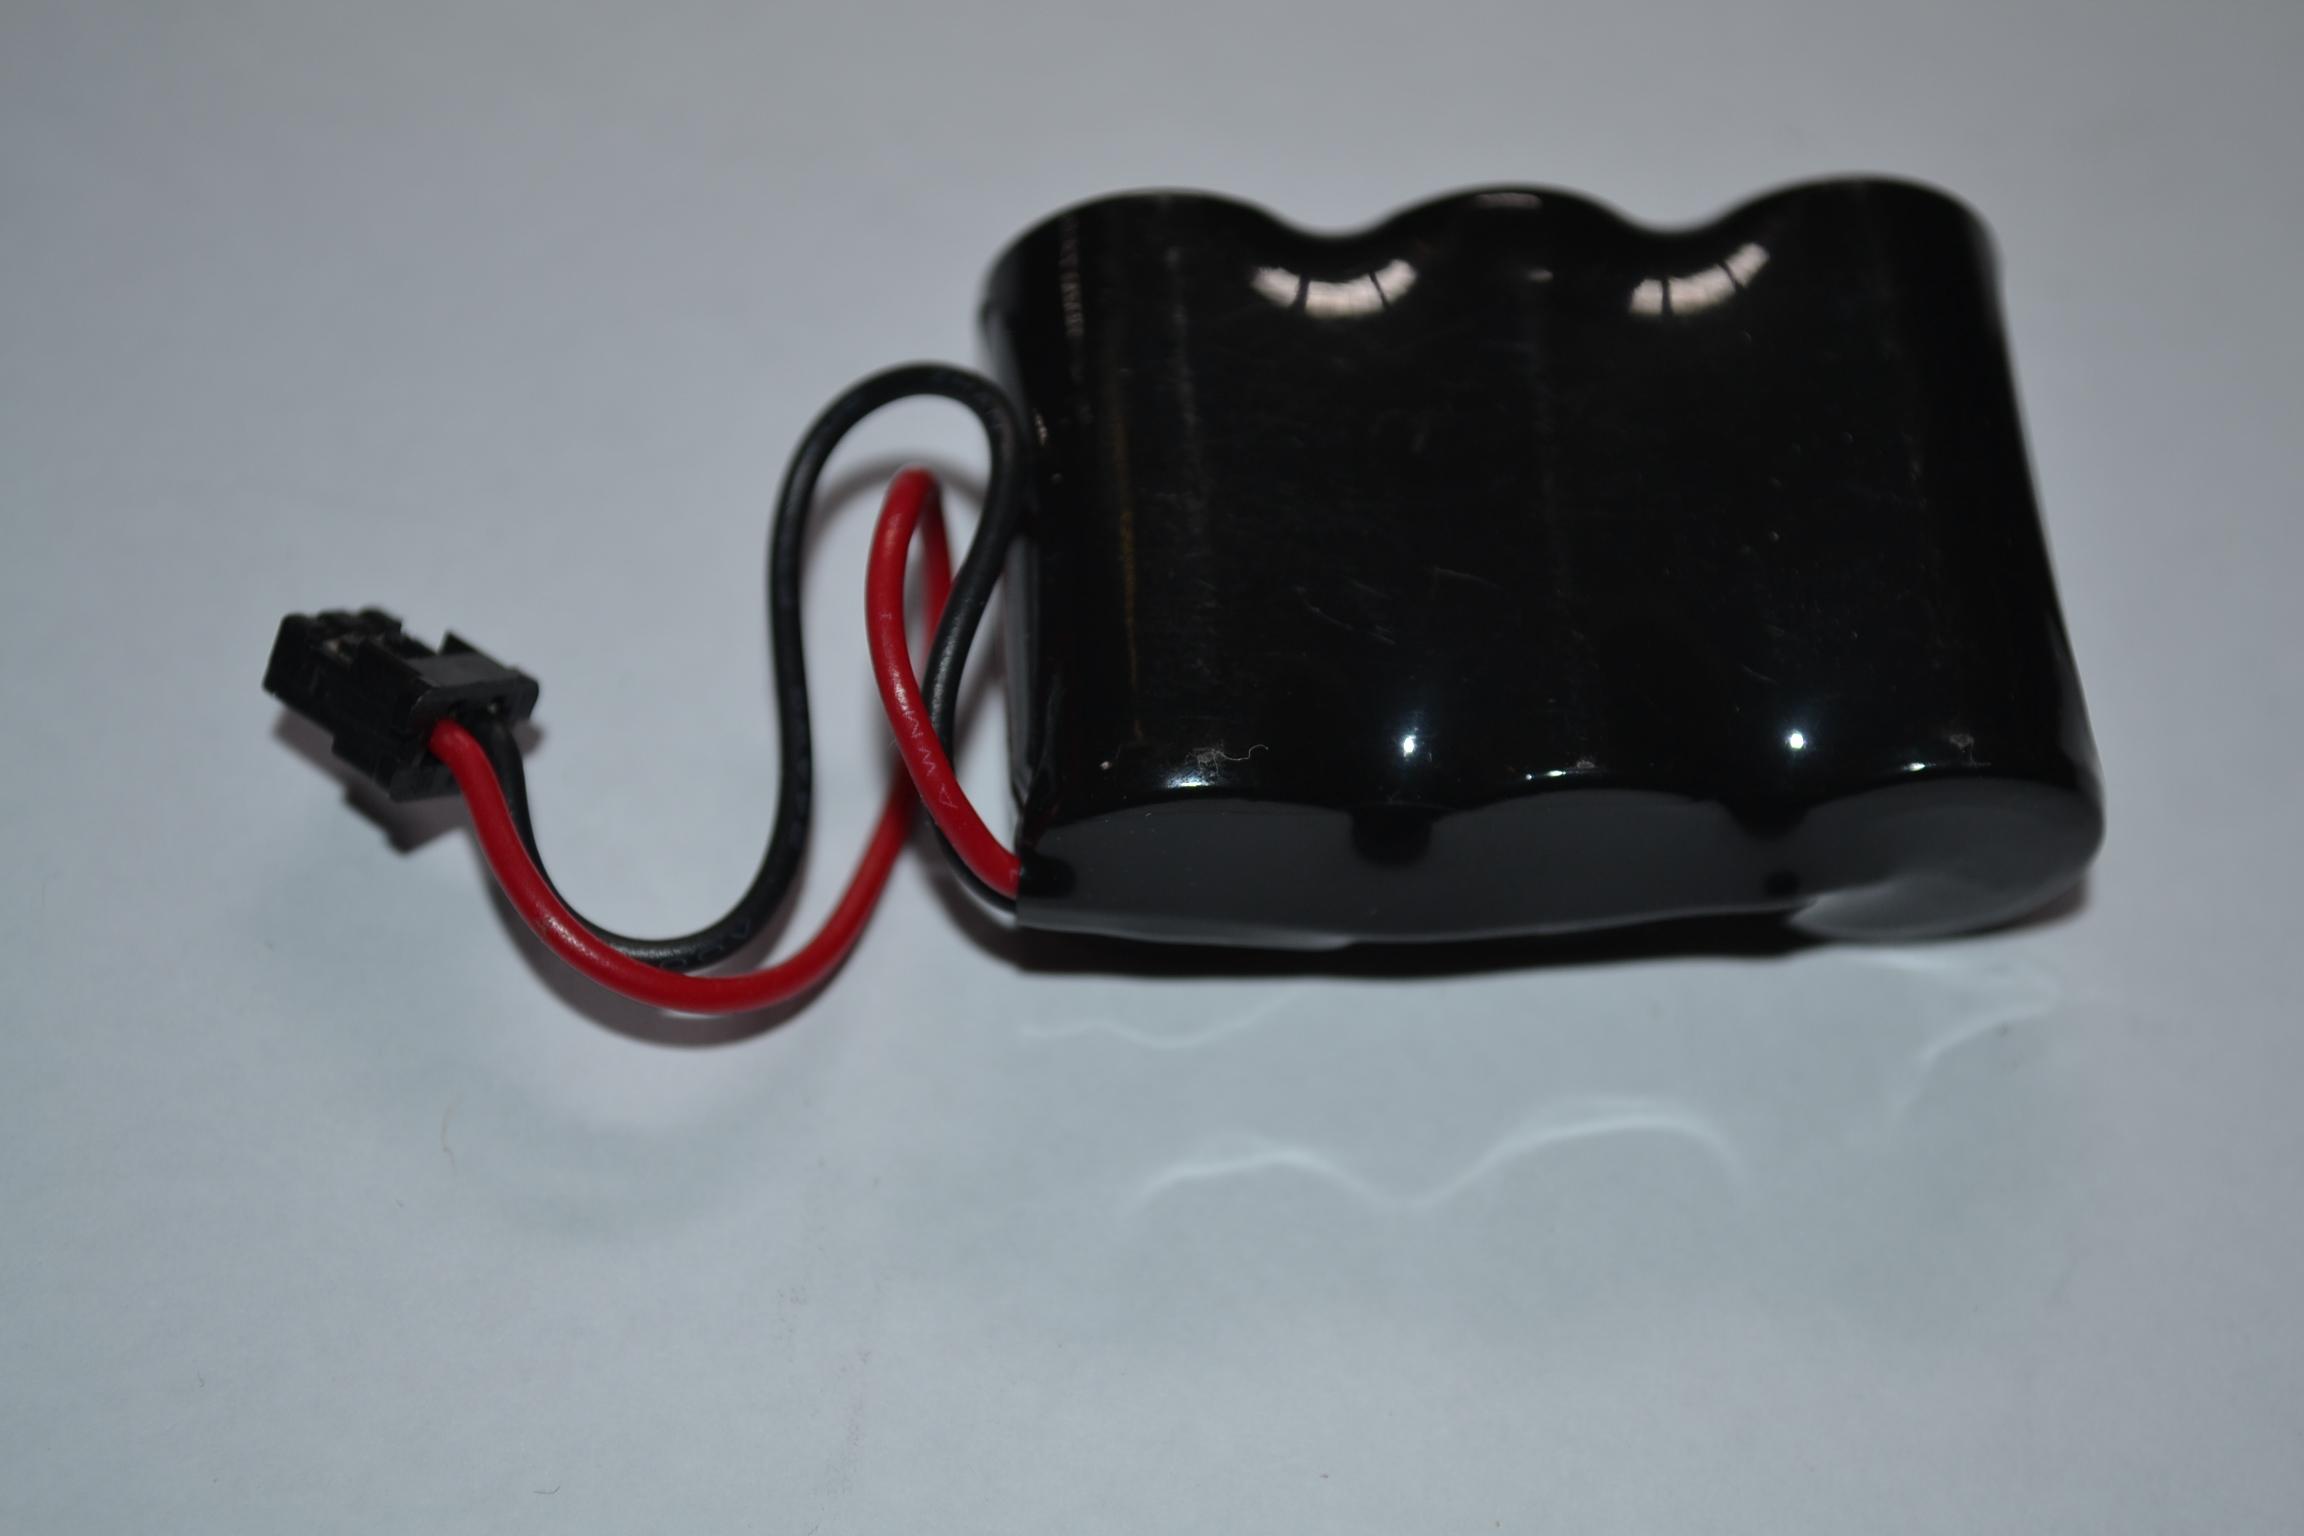 GE 86156 Phone Battery 3.6V 400MAH Nicad Panasonic Sony Uniden Toshiba